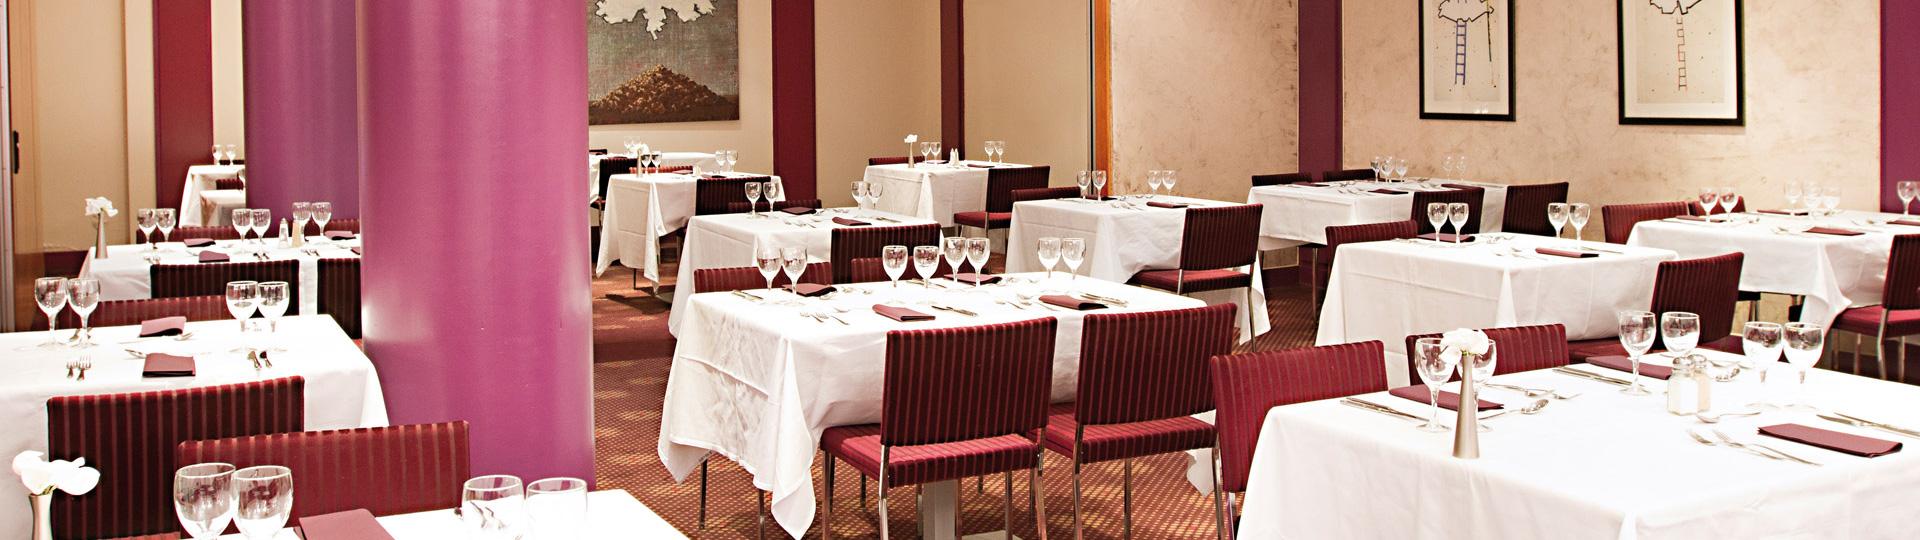 Hôtel et restaurant La Villa Modigliani